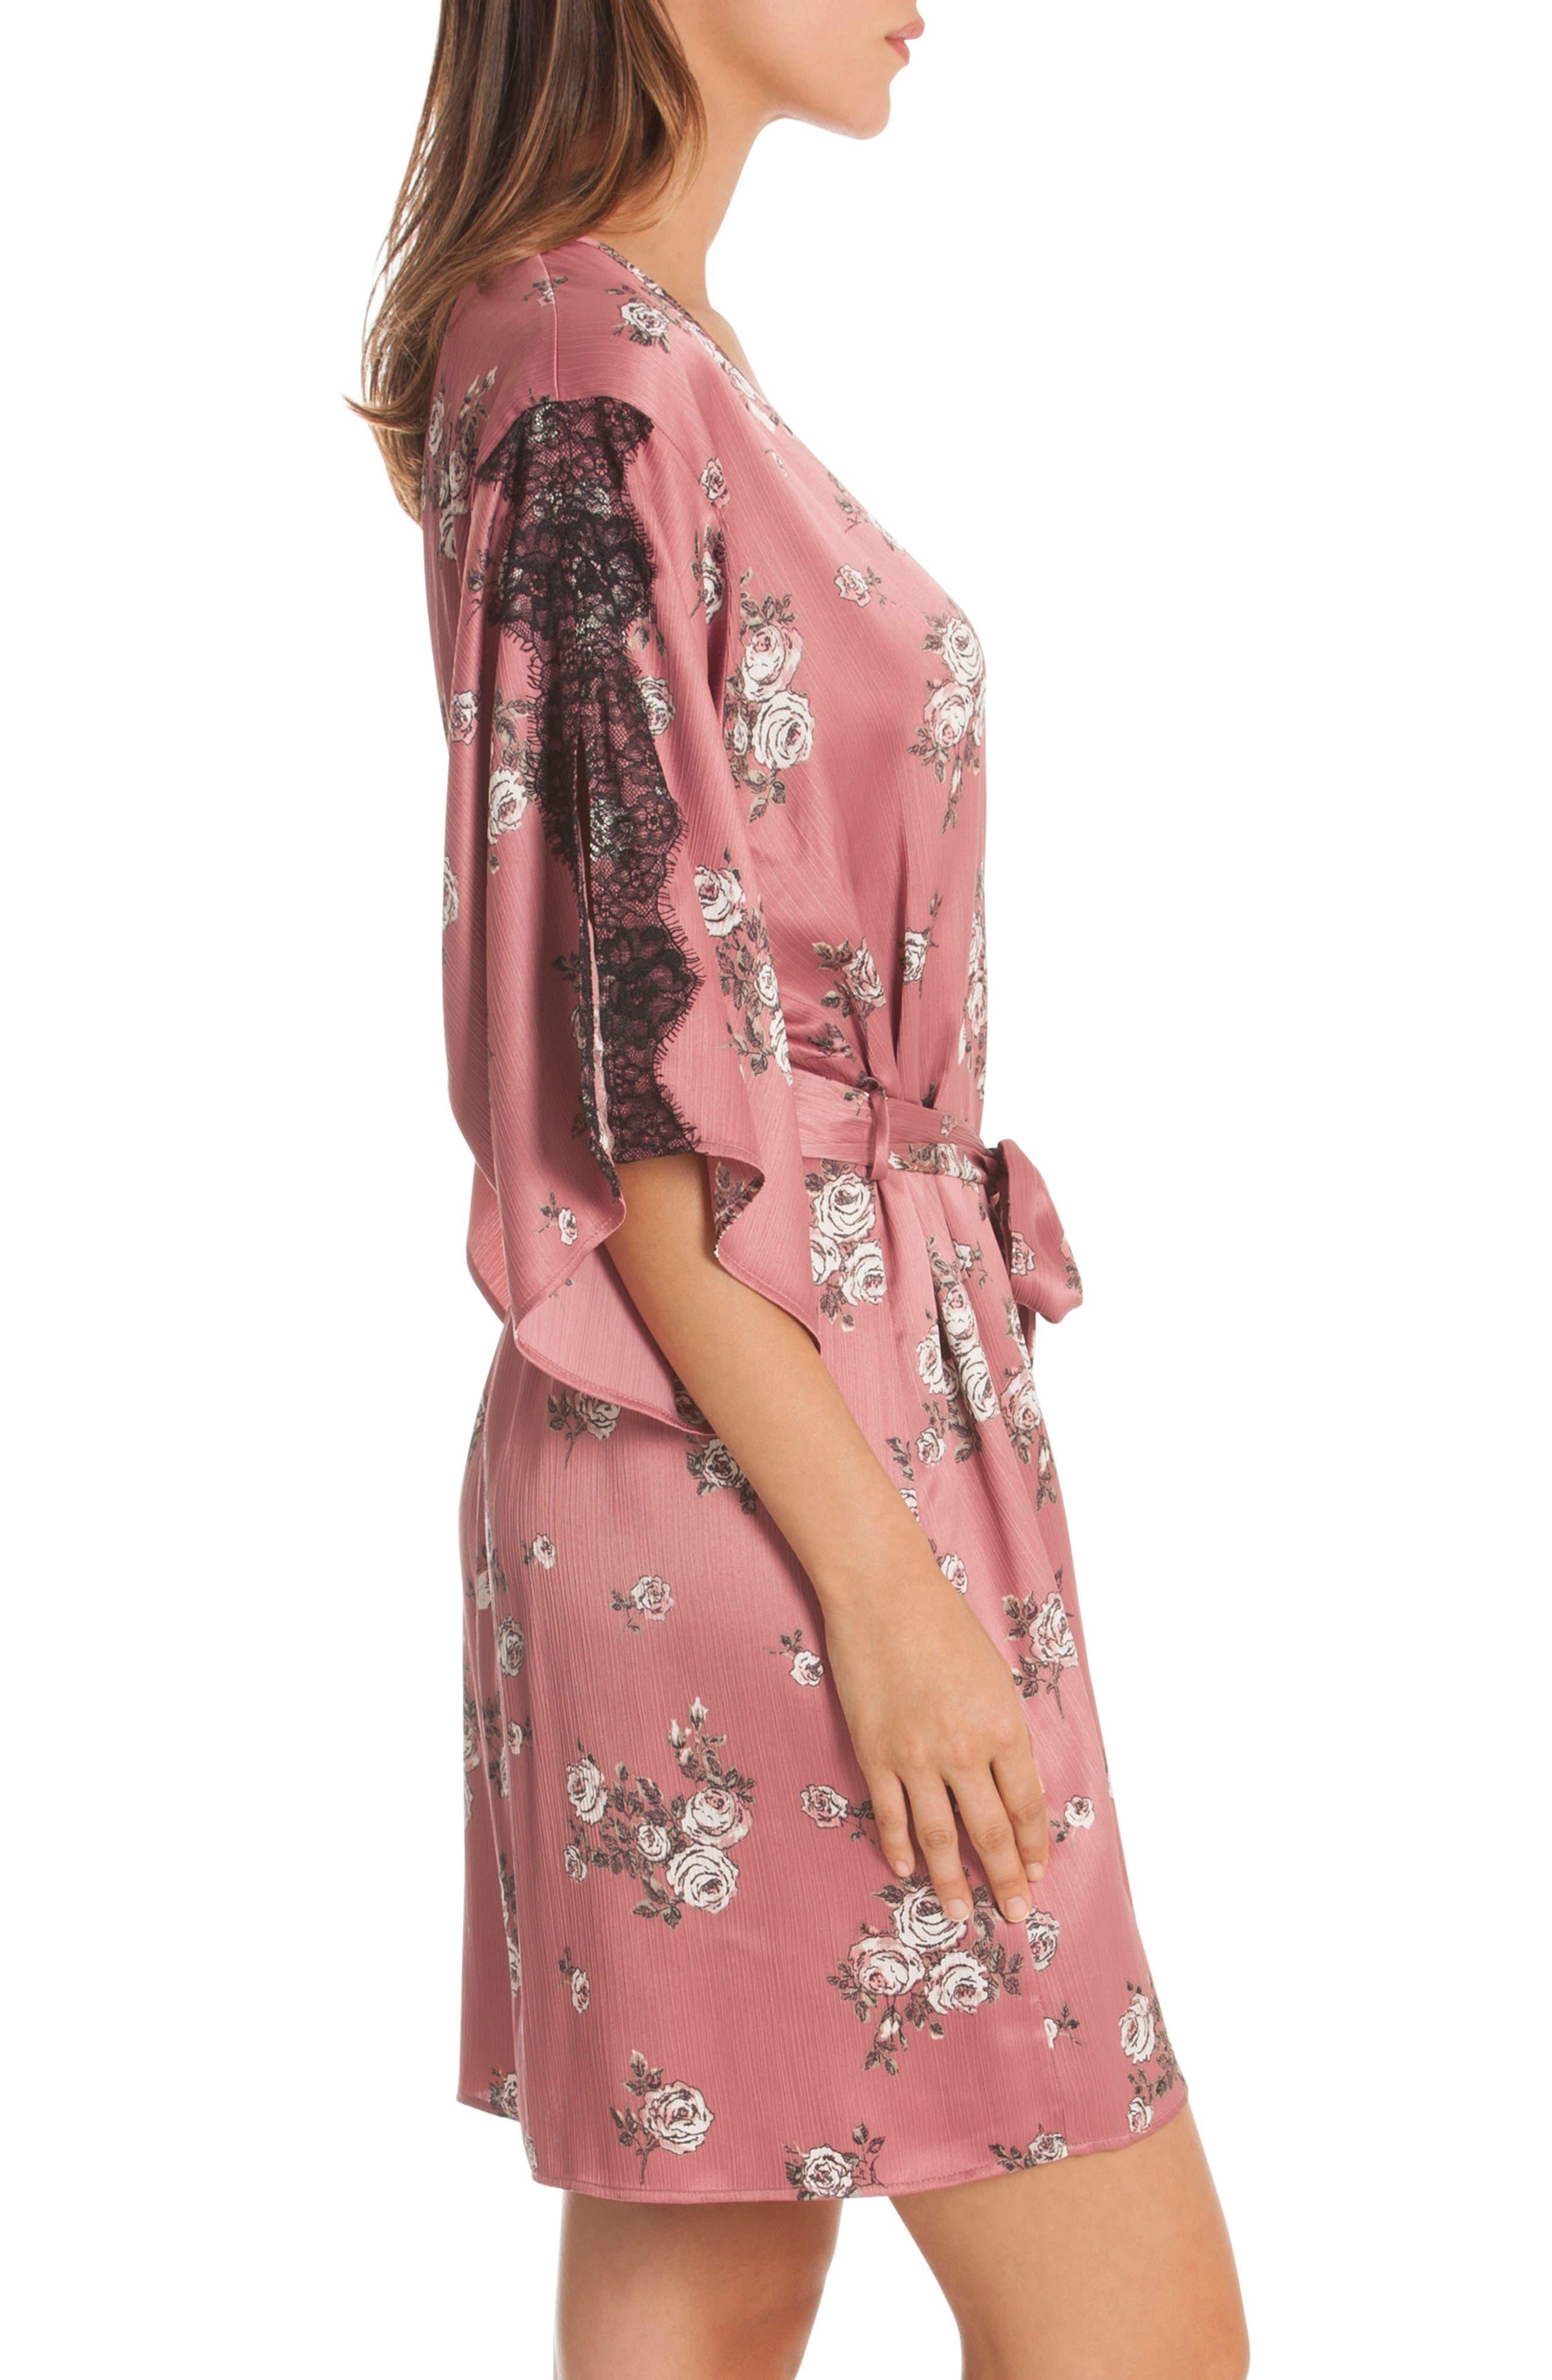 Tegan Kimono Wrap,                             Alternate thumbnail 3, color,                             ROSE